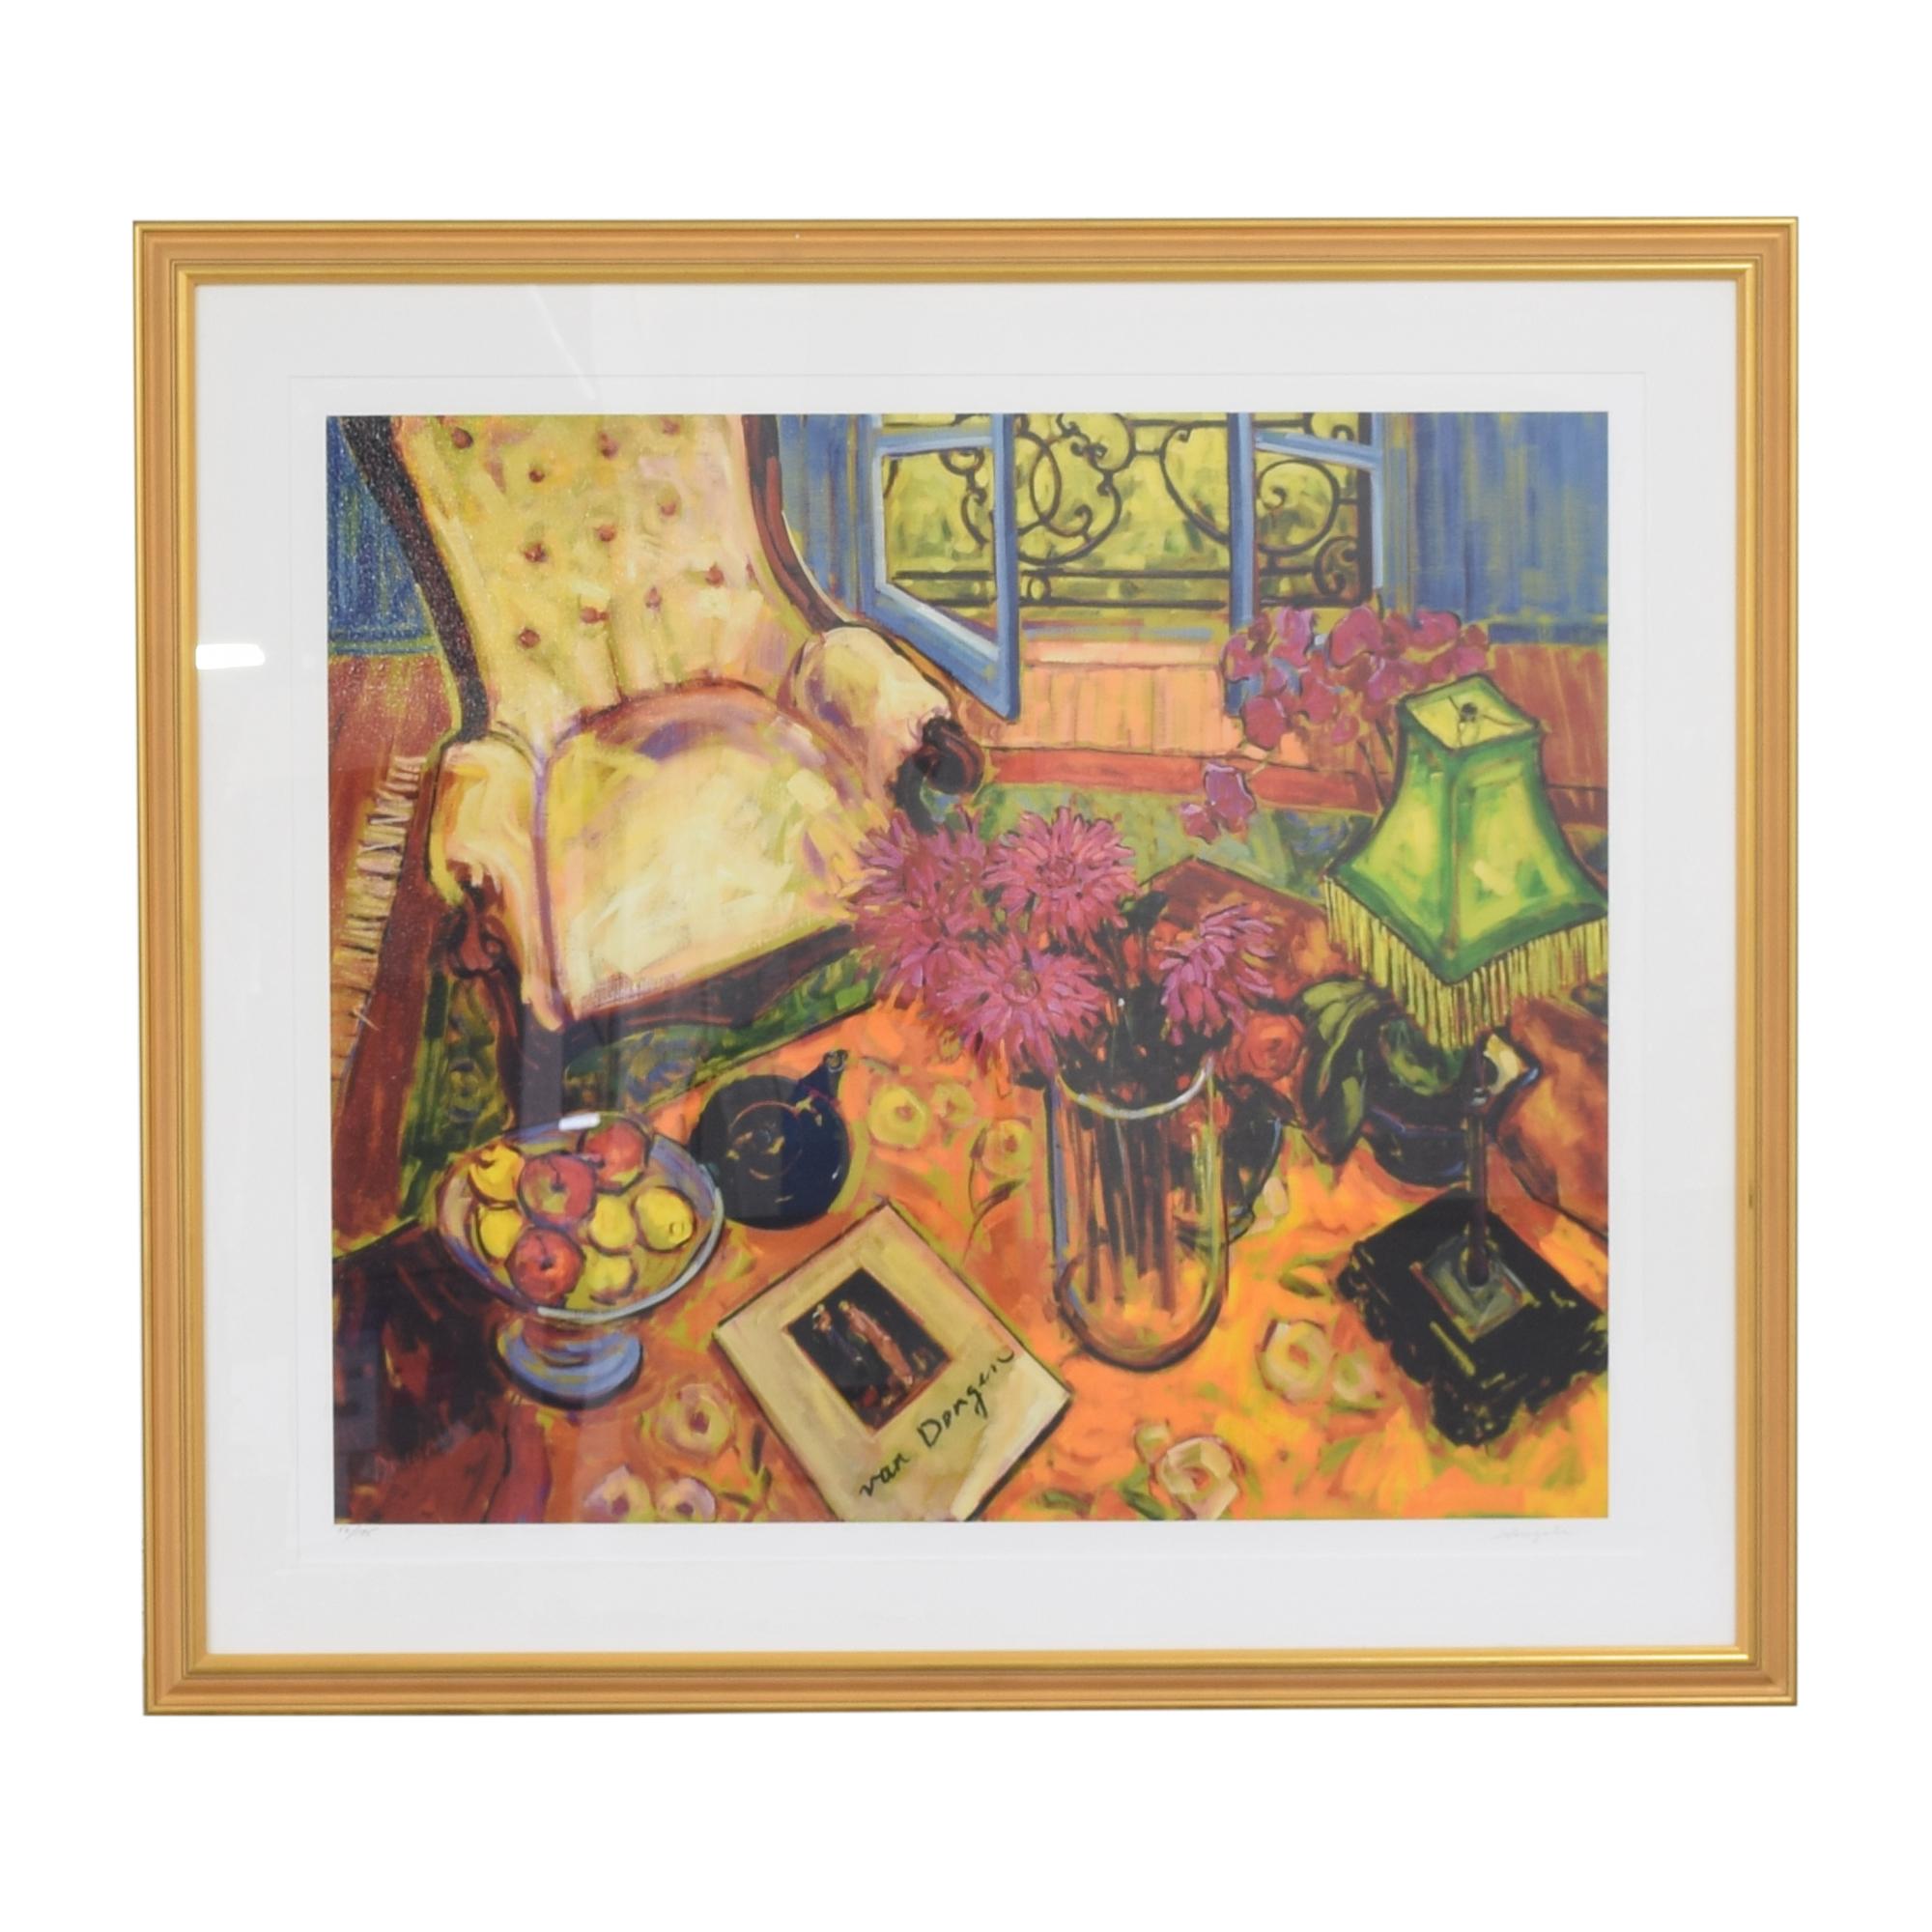 Jae Dougall Framed Wall Art on sale